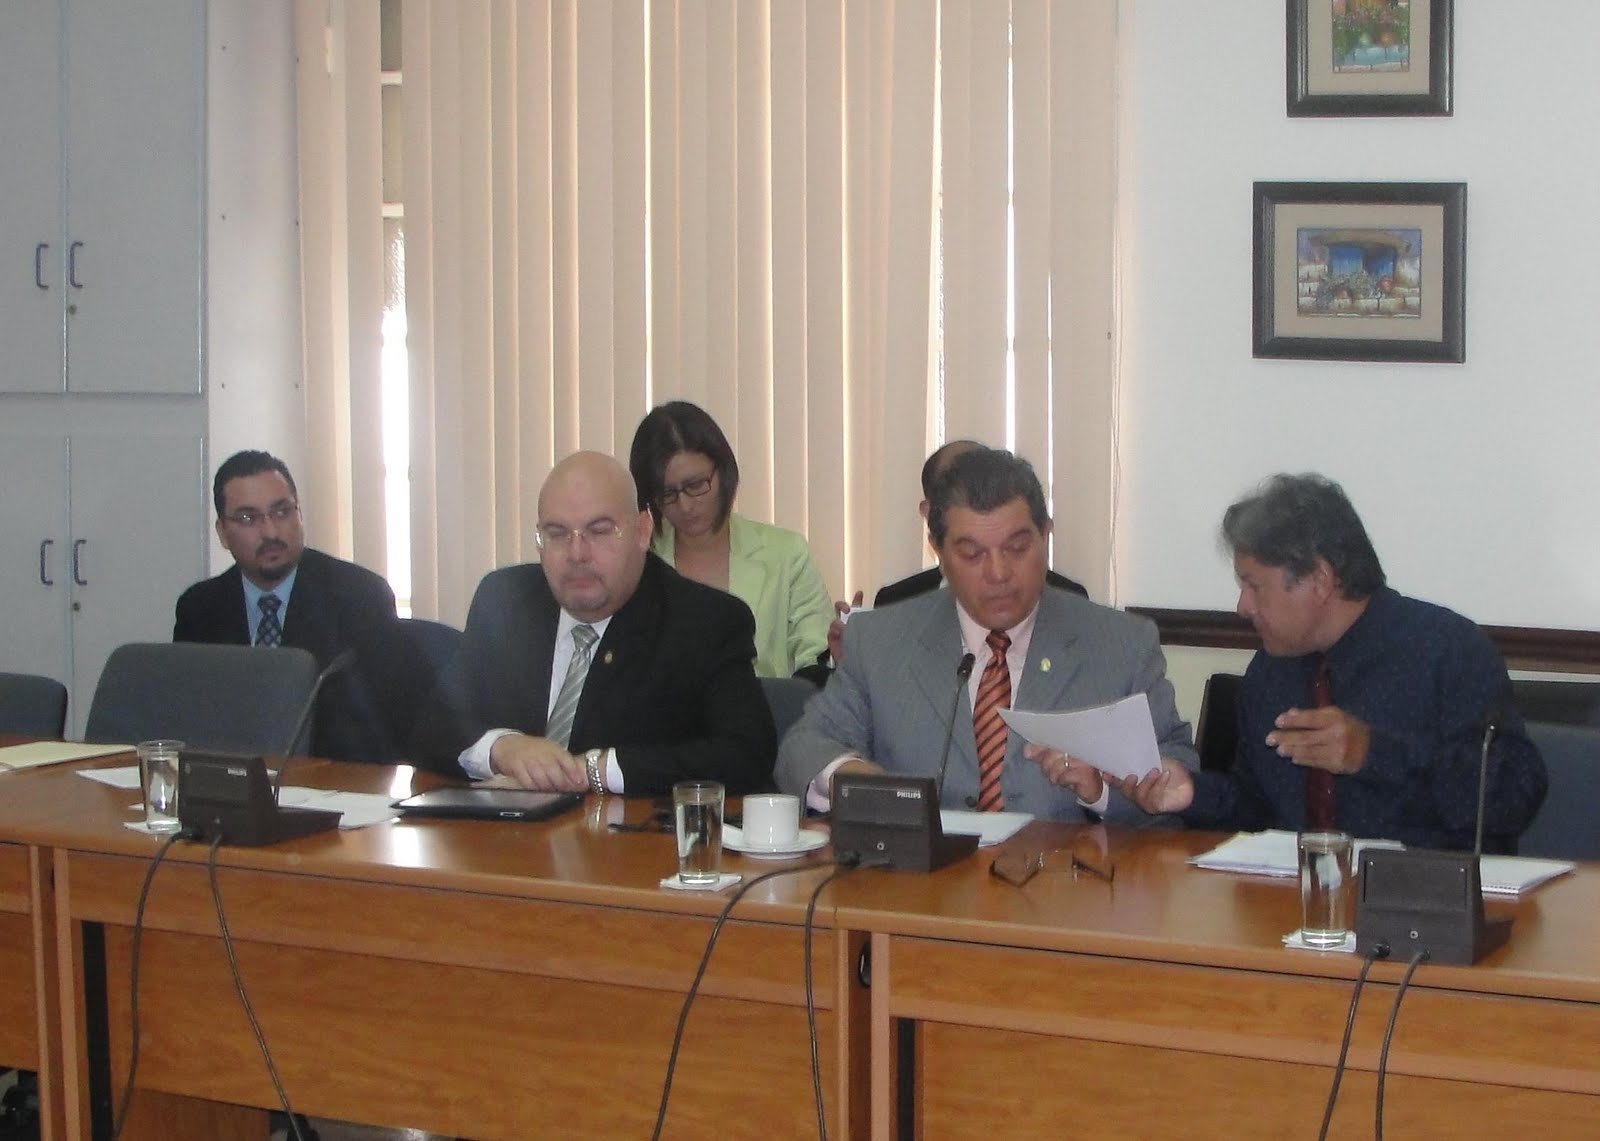 La voz liberacionista comisi n libertaria solicitar for Ministerio de migracion